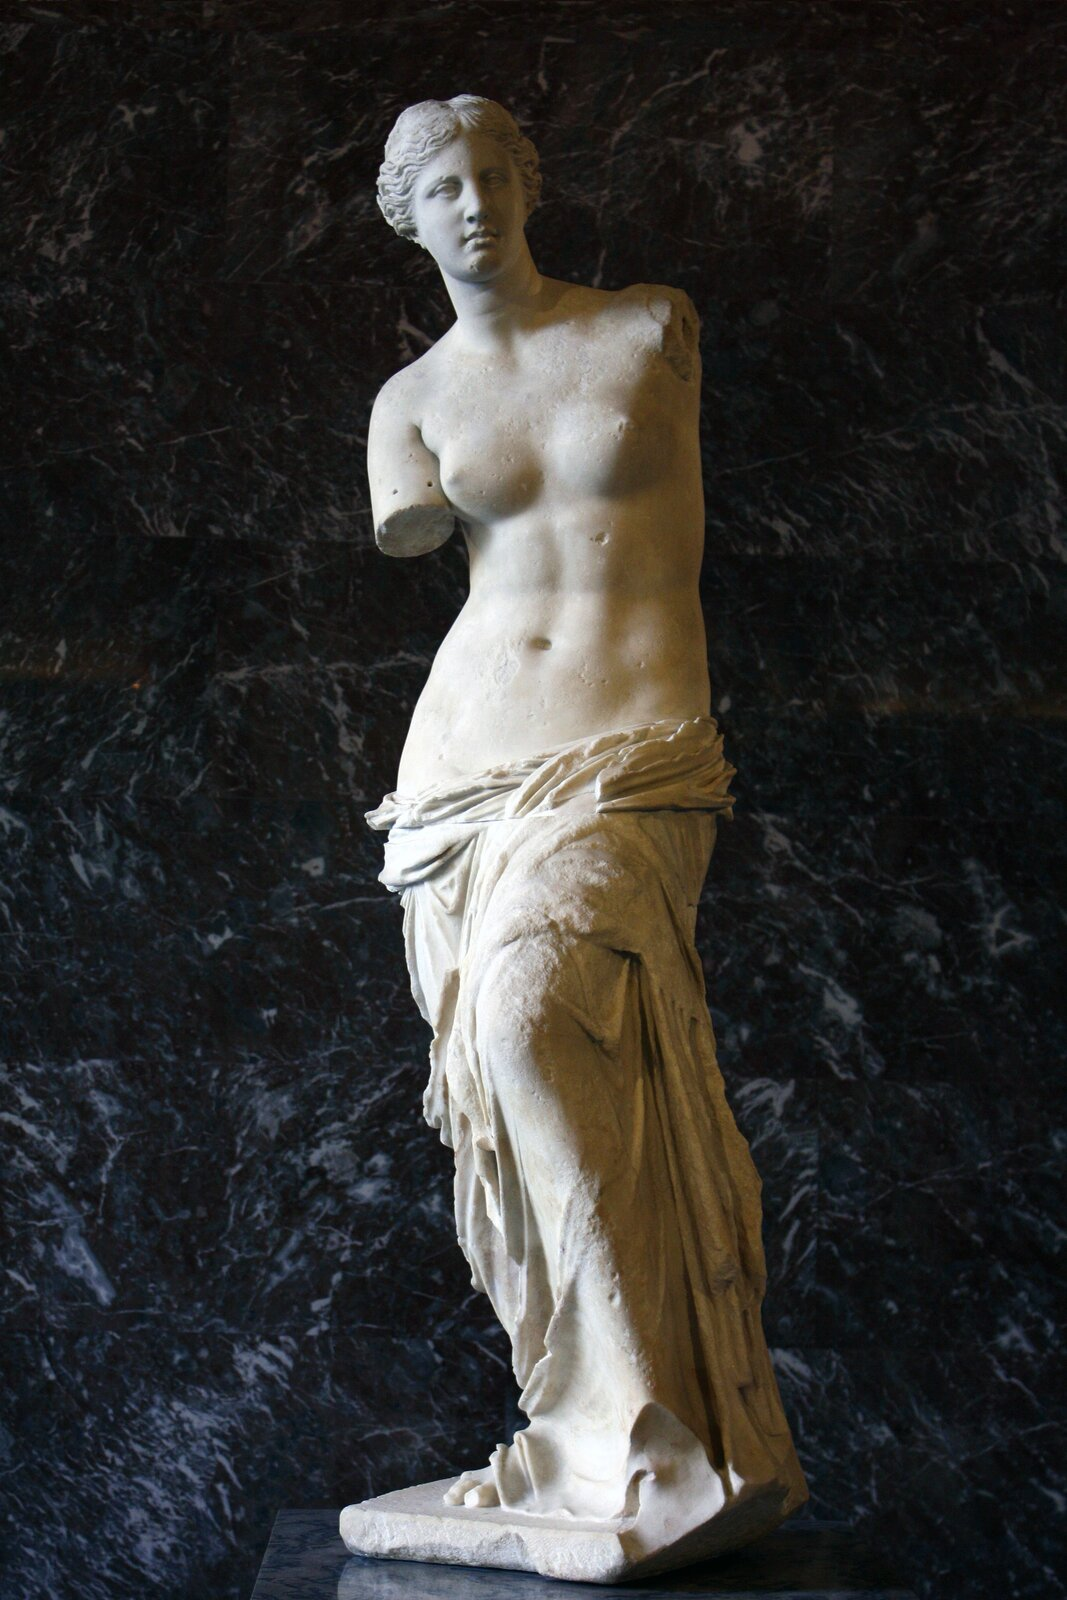 Wenus zMilo,ok. 130–100 p.n.e., rzeźba zmarmuru, Luwr, Paryż Wenus zMilo,ok. 130–100 p.n.e., rzeźba zmarmuru, Luwr, Paryż Źródło: Mattgirling, licencja: CC BY-SA 3.0.